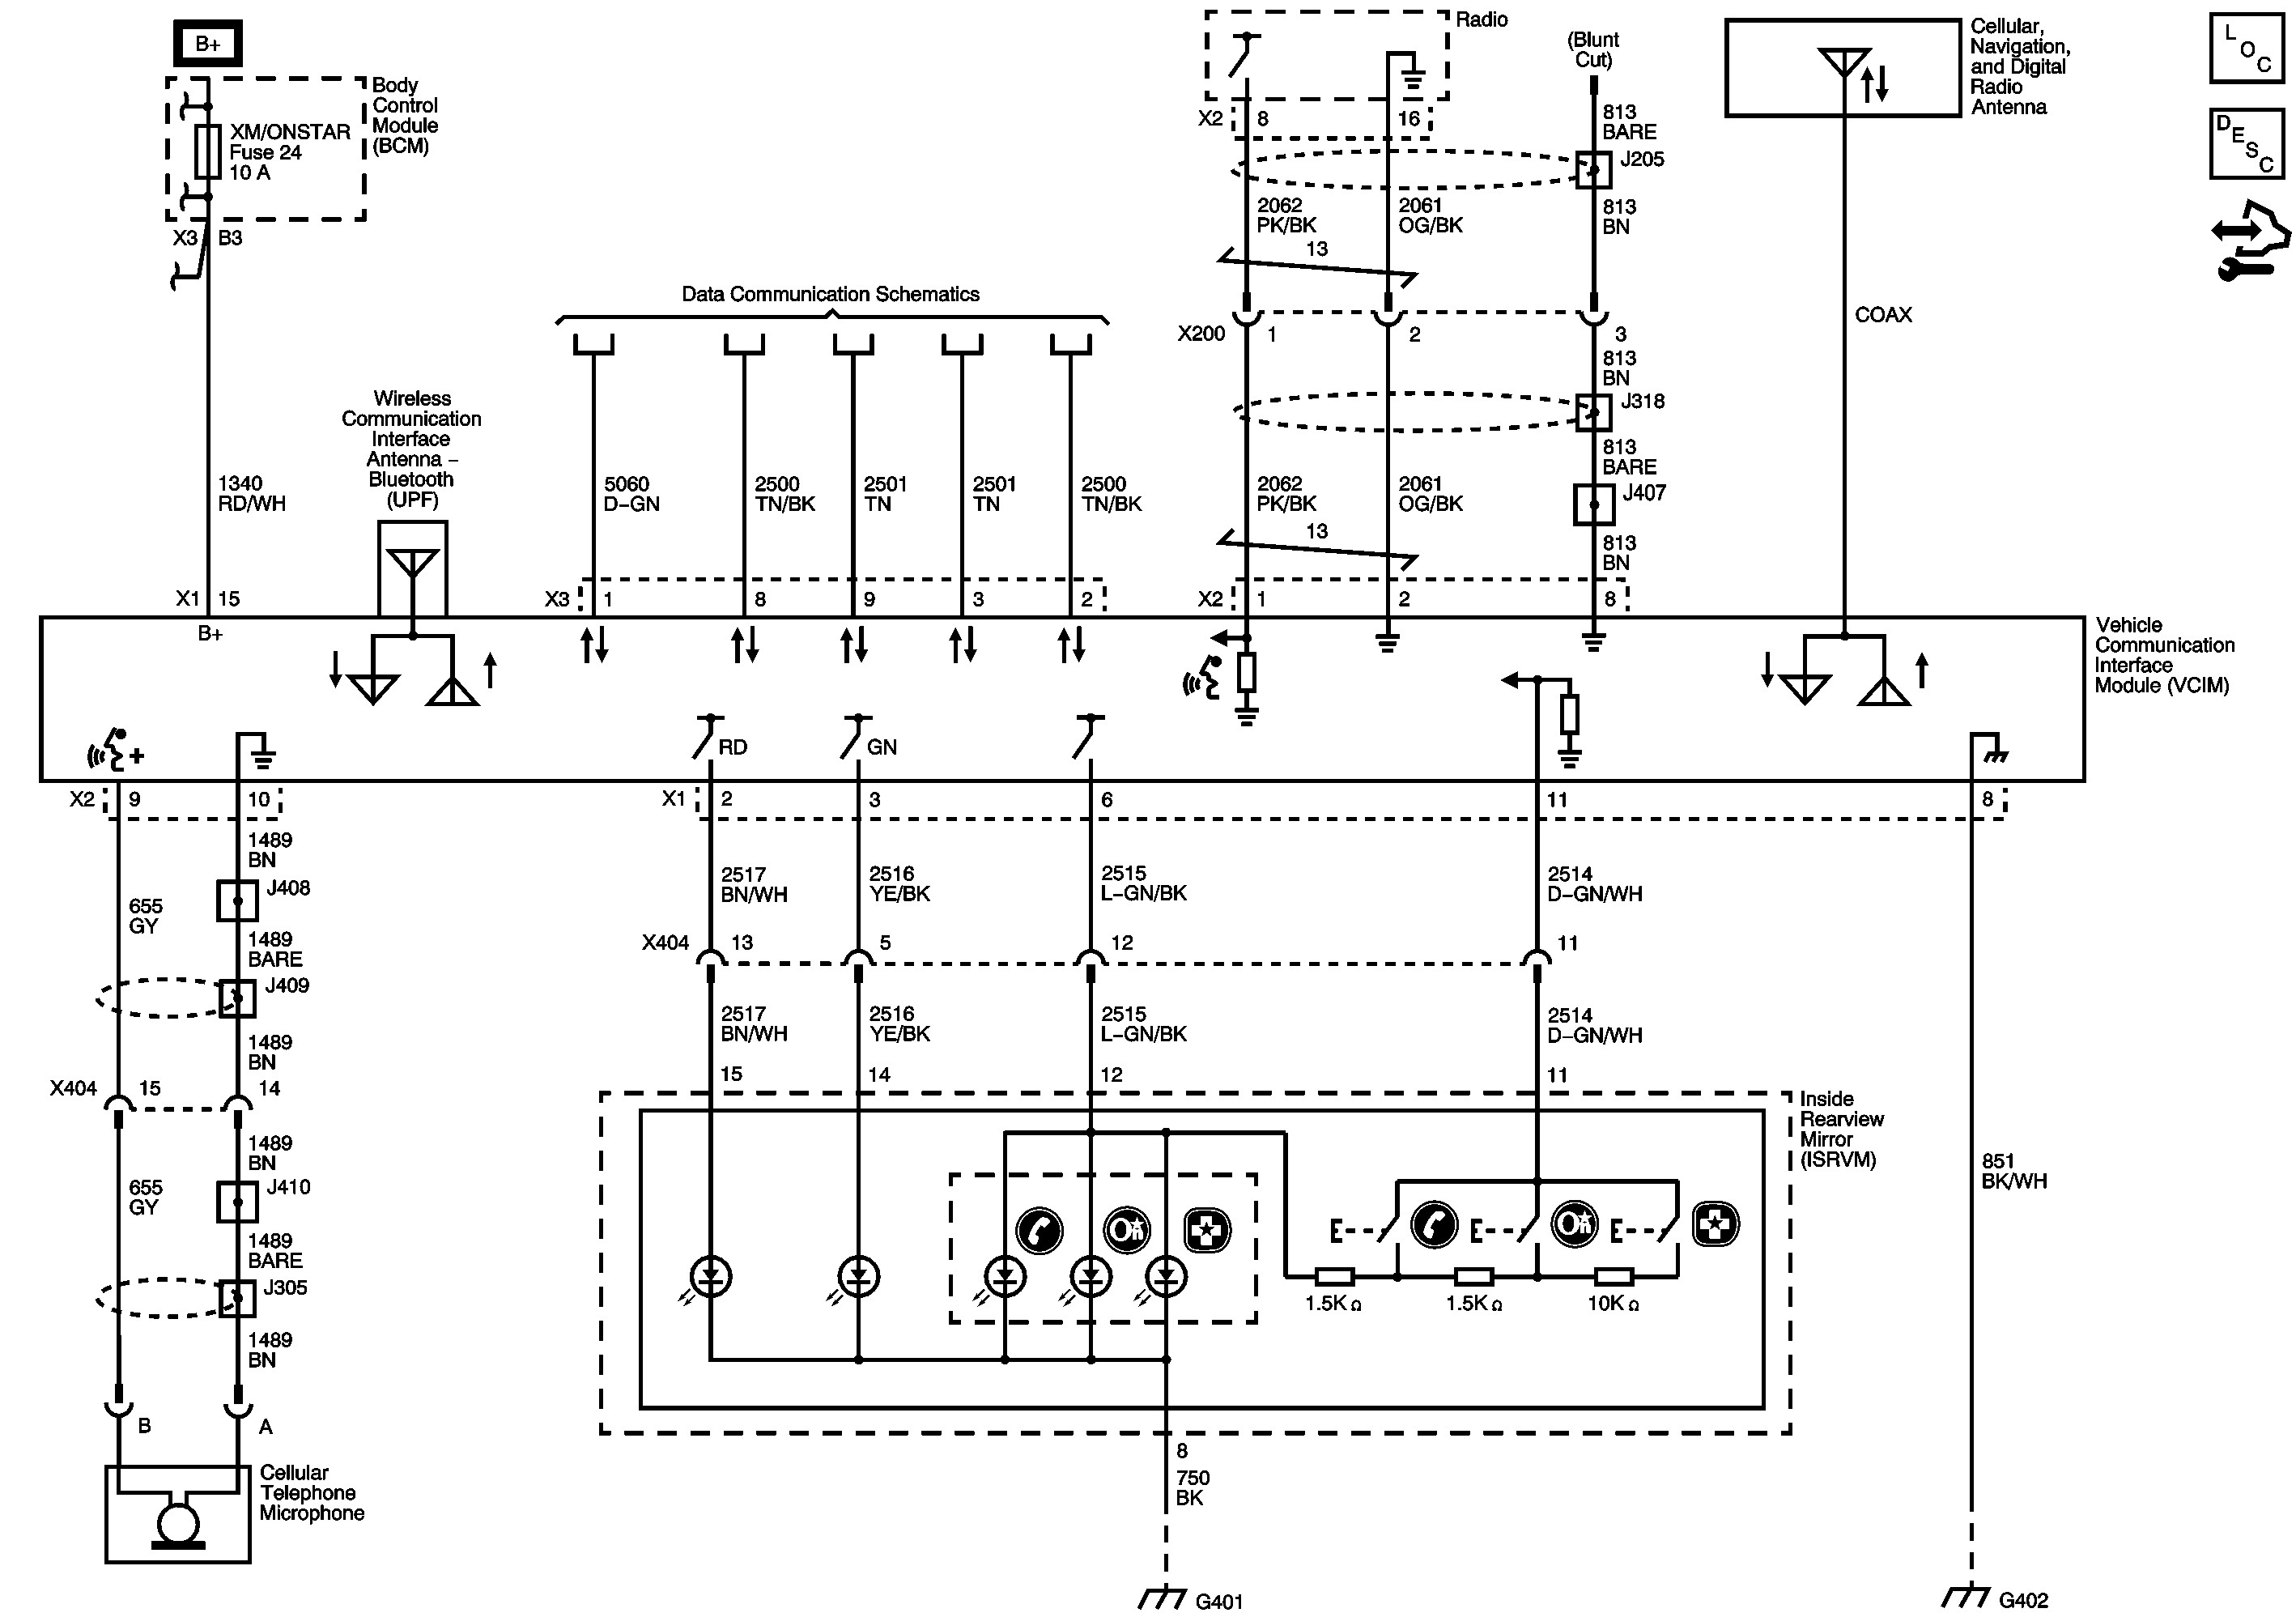 Drivetrain Diagram 4wd Star Schematics Driveline Control 4wd Driveline Control Of Drivetrain Diagram 4wd